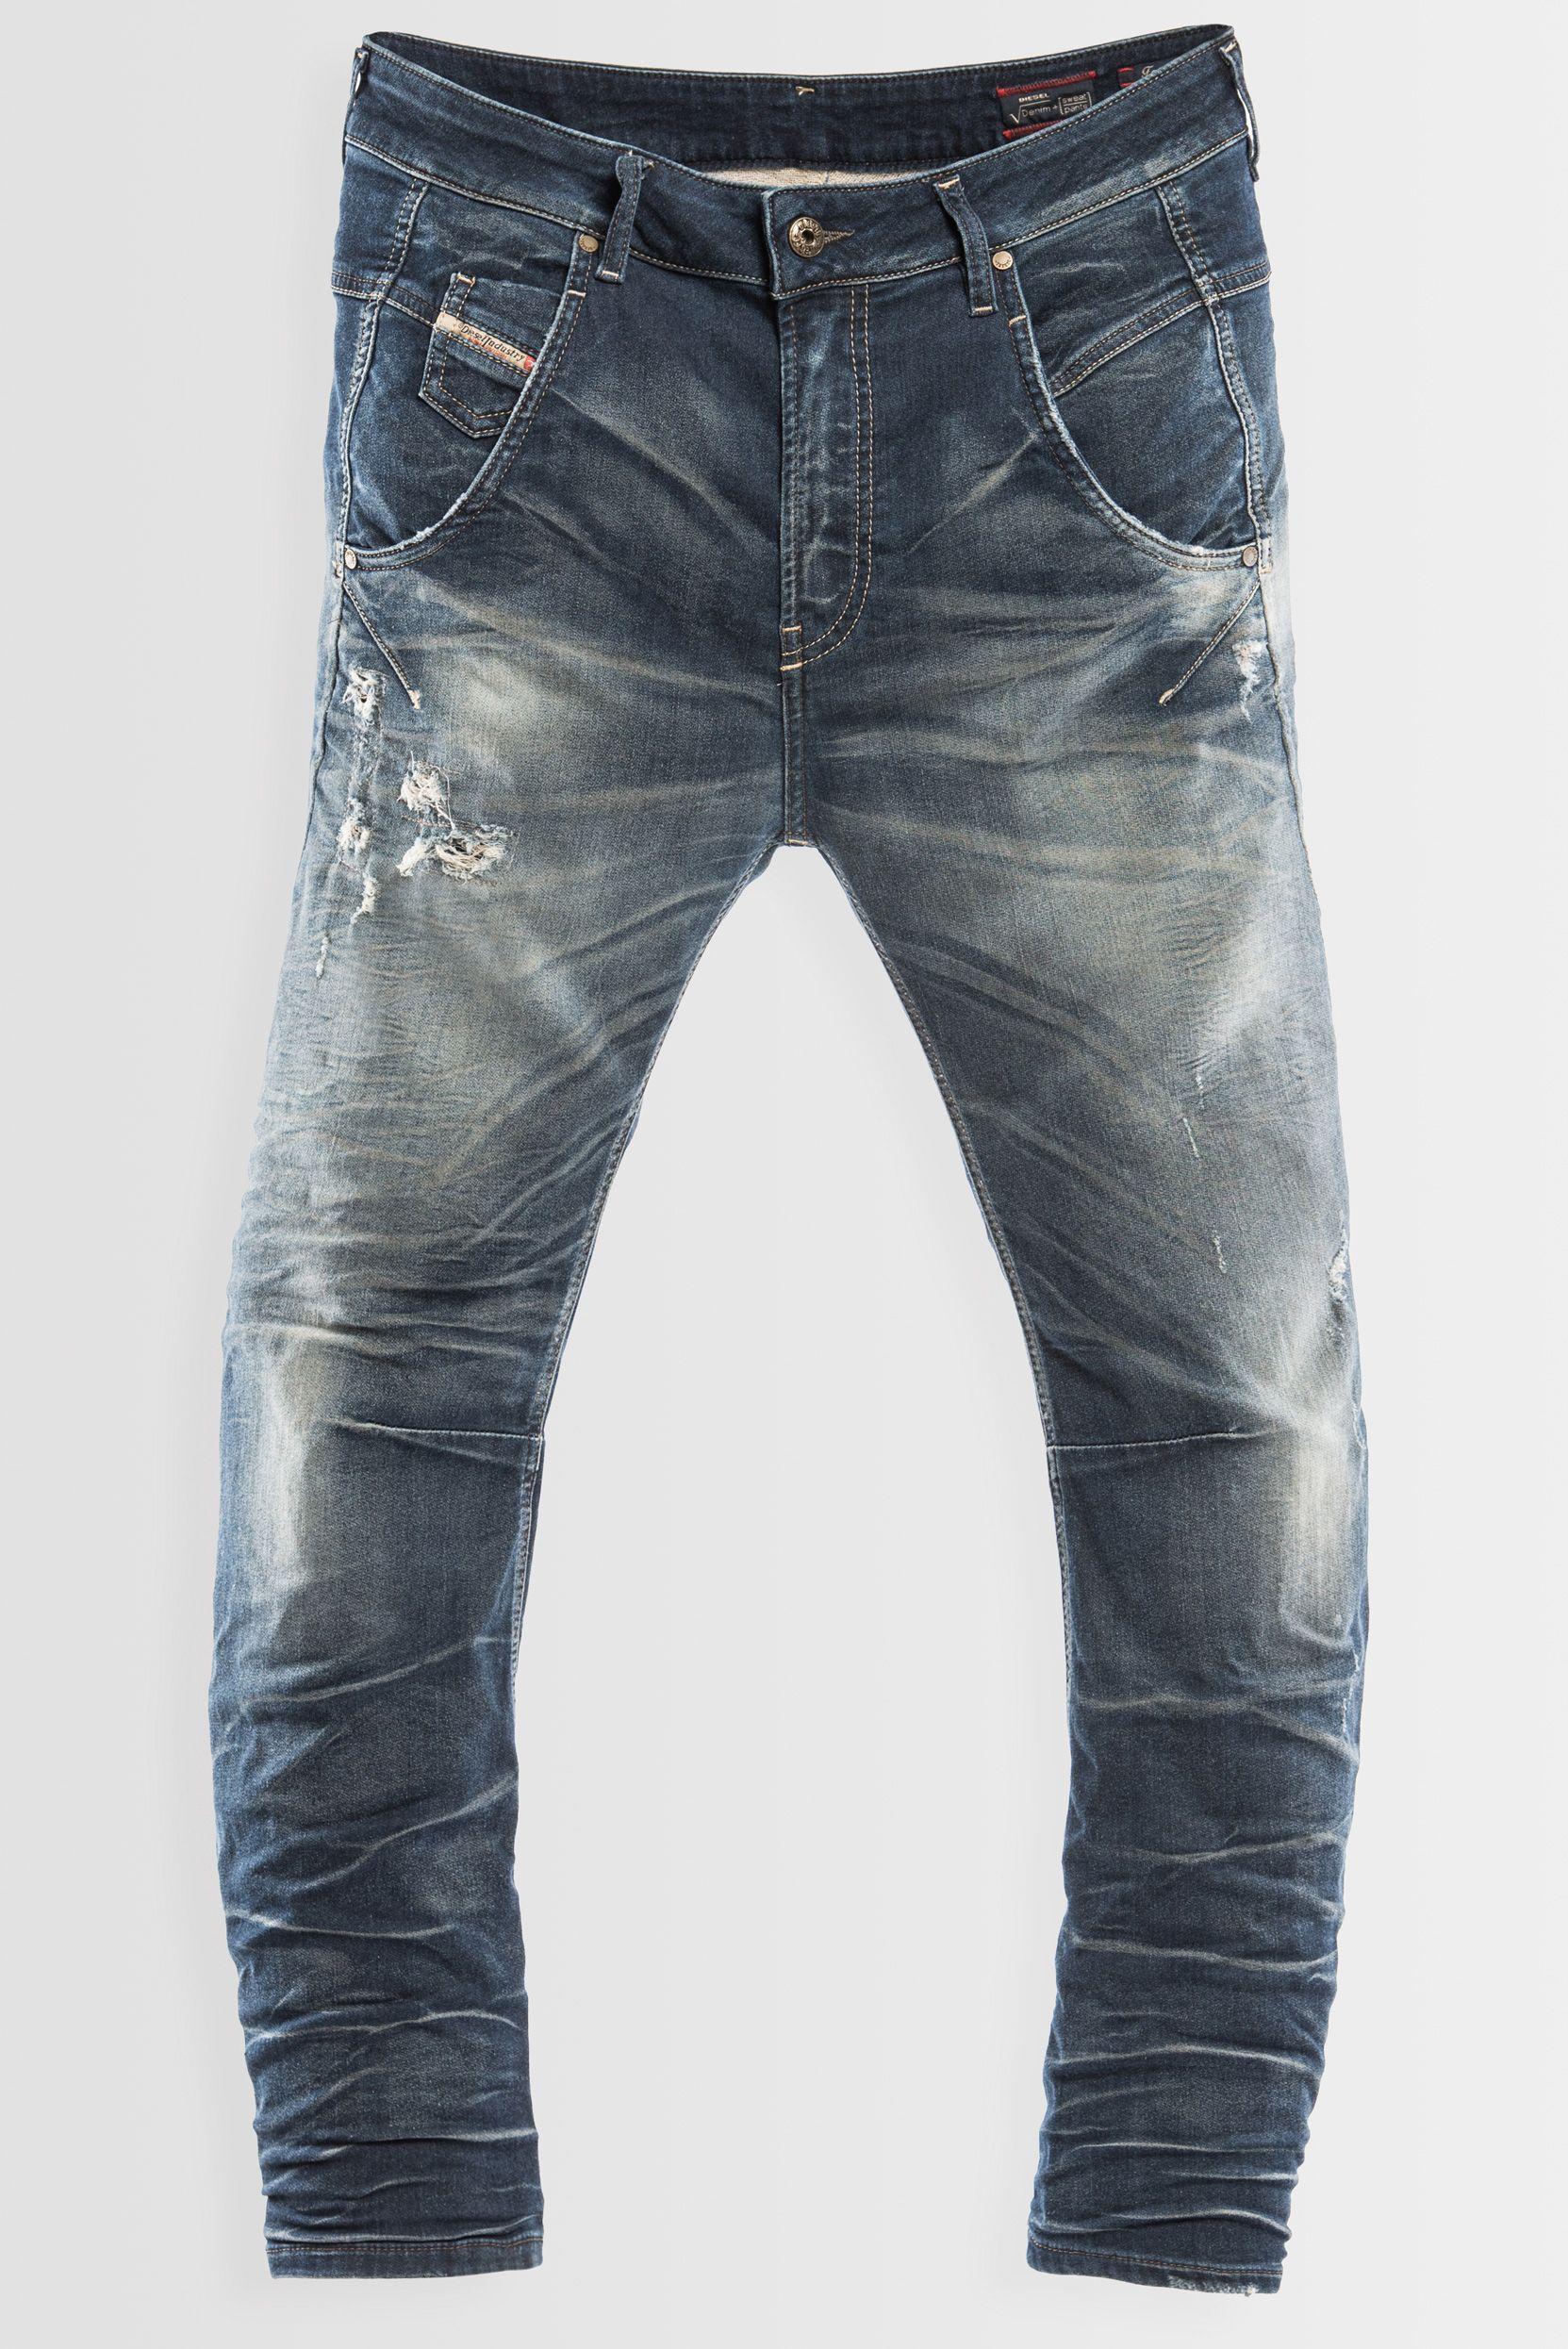 Diesel  jeans  FAYZA-NE 0604N  JoggJeans  59fa6656e2